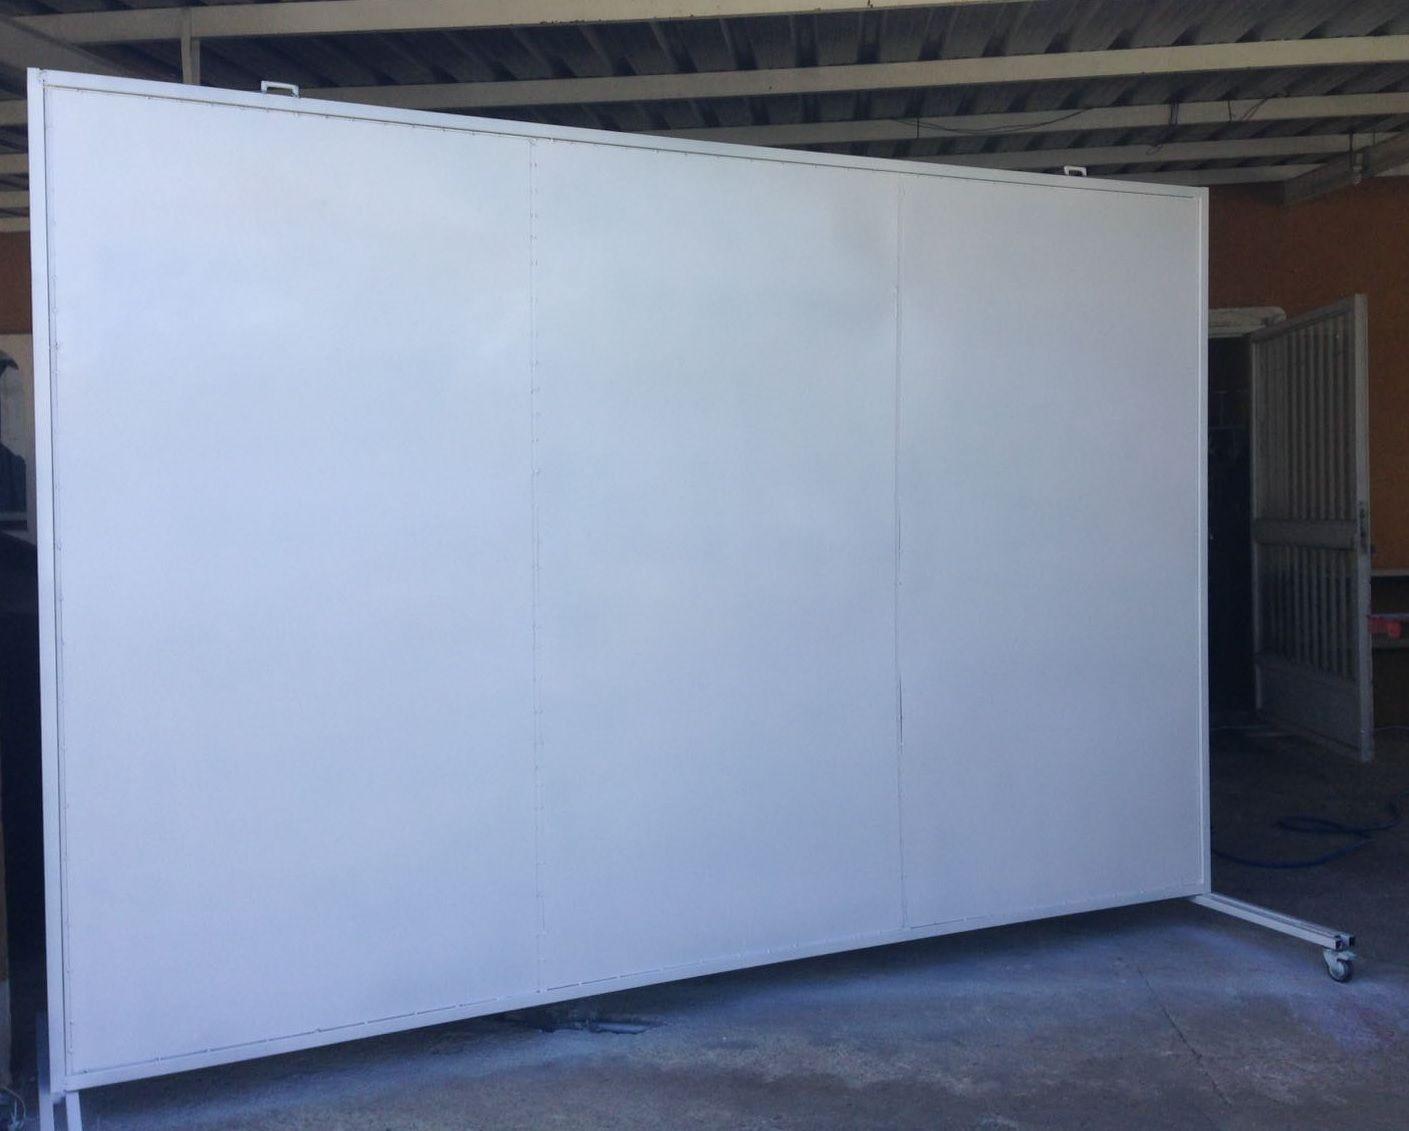 Panel separador de espacios o biombo para separar ambientes en tu almac n taller estudio Separador de espacios